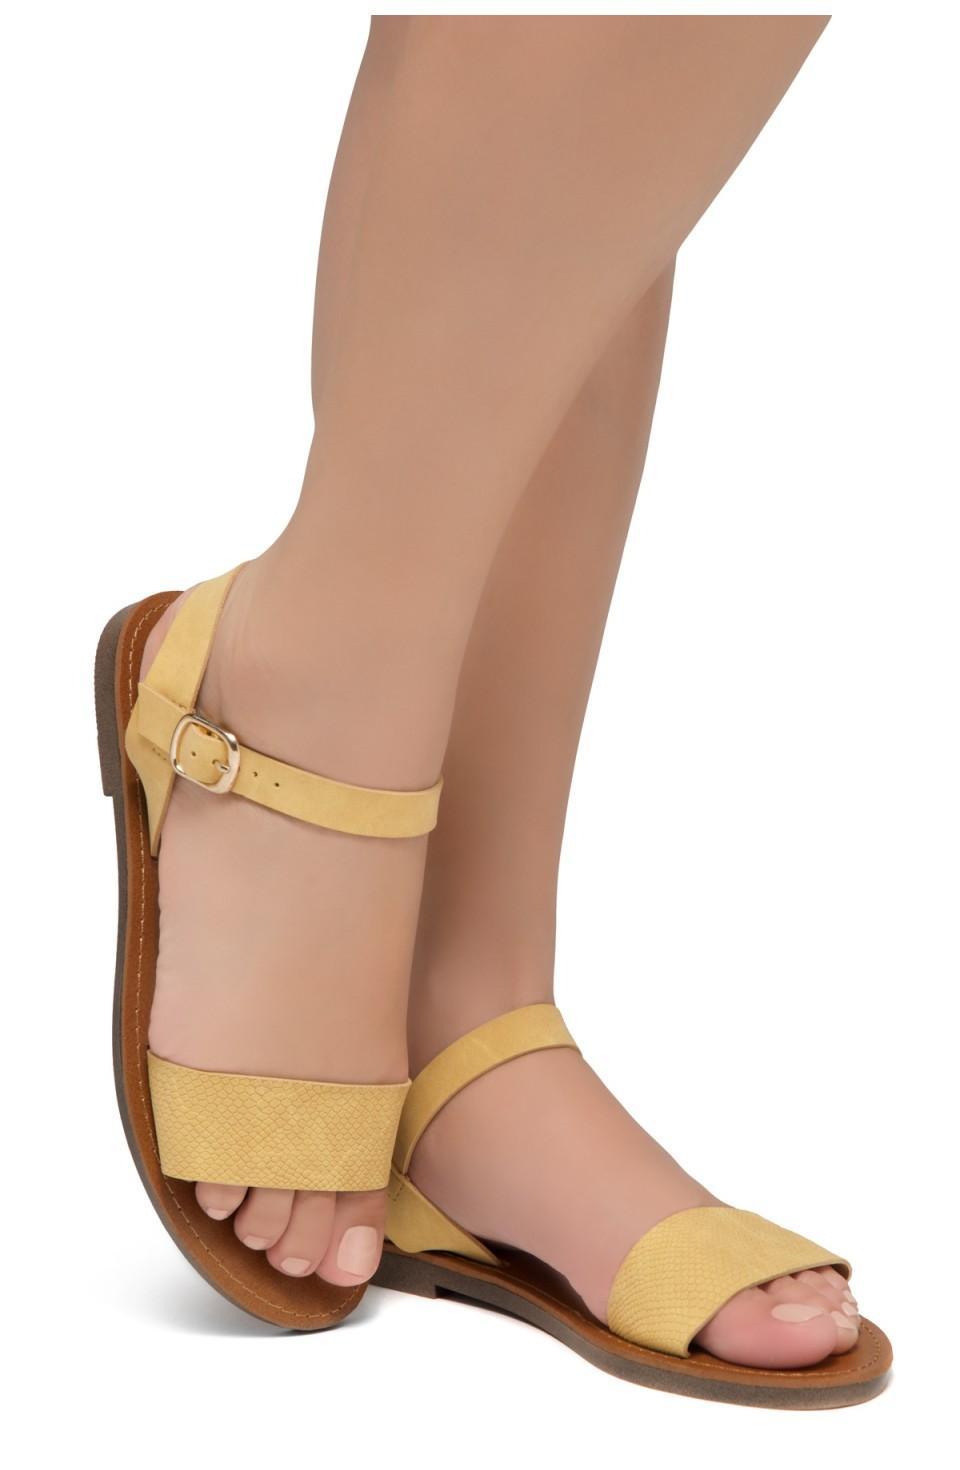 Shoe Land Keetton- Women's Open Toes One Band Ankle Strap Flat Sandals (1896 MUSTNU)